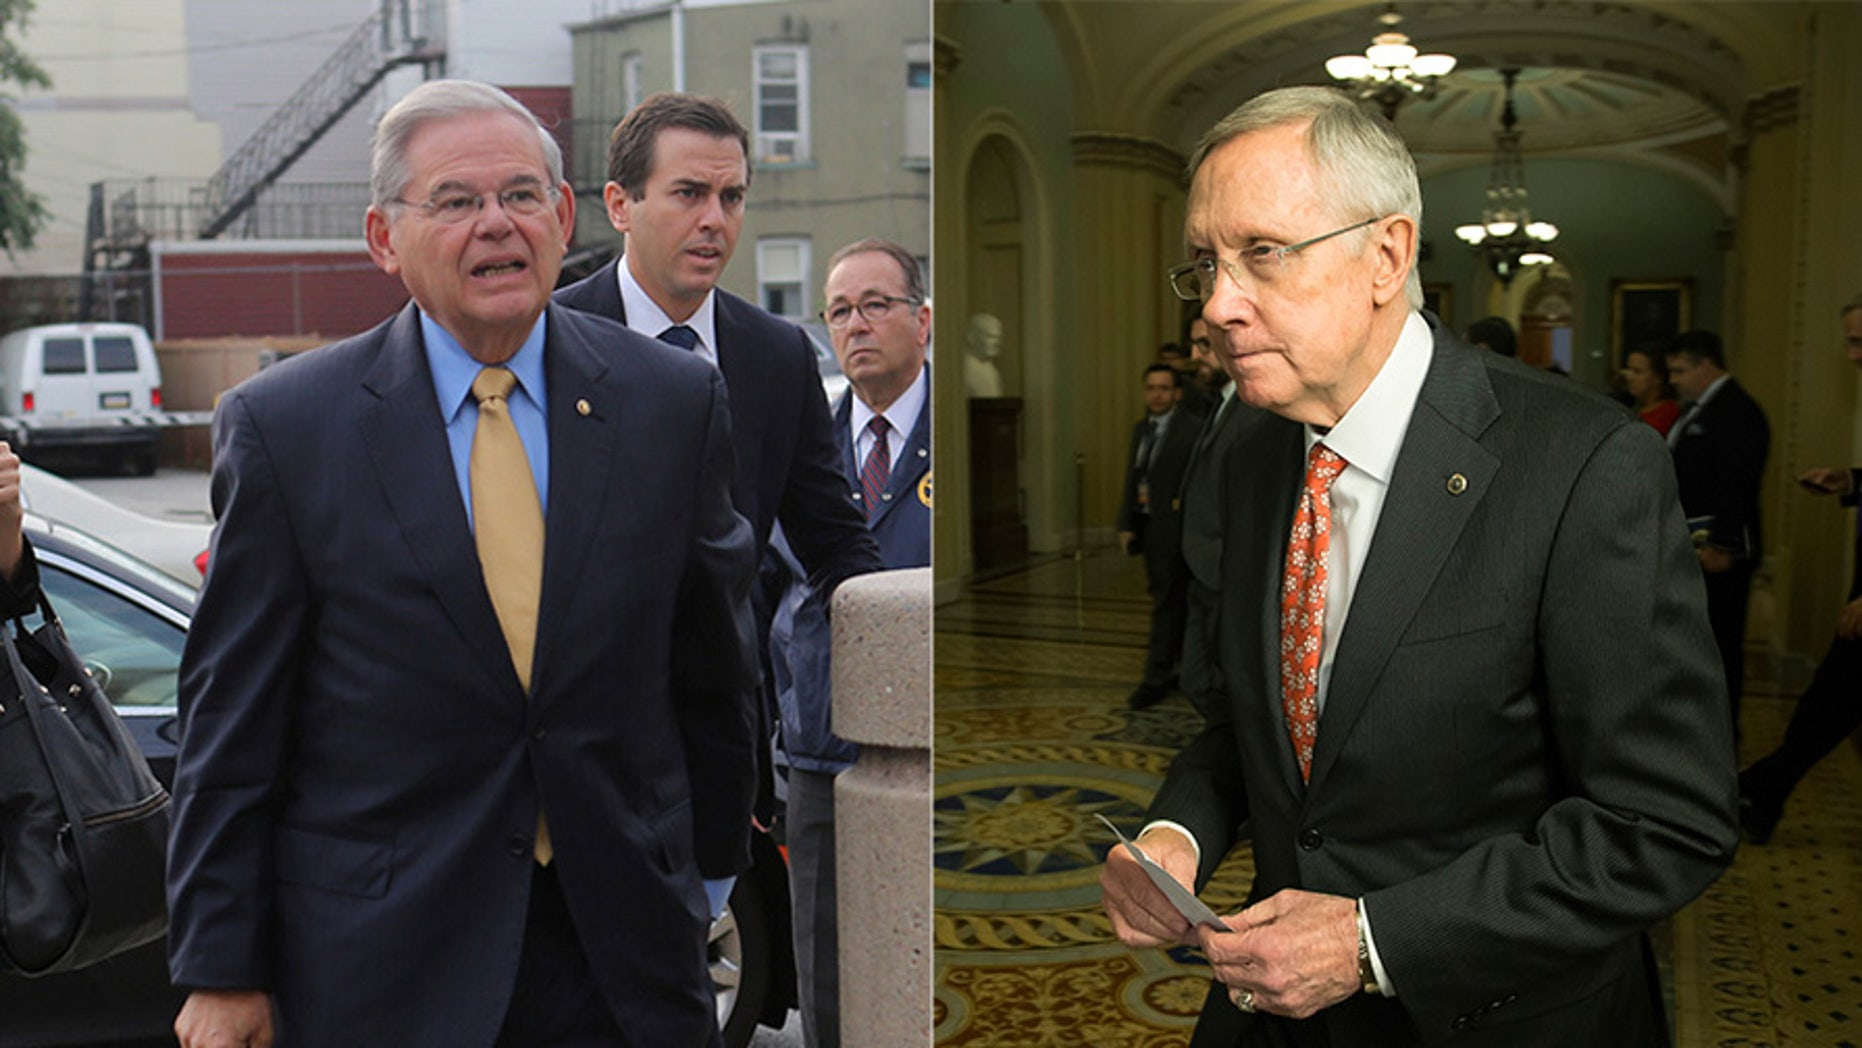 At left, Sen. Bob Menendez, D-N.J.; at right, former Senate Democratic Leader Harry Reid, D-Nev.